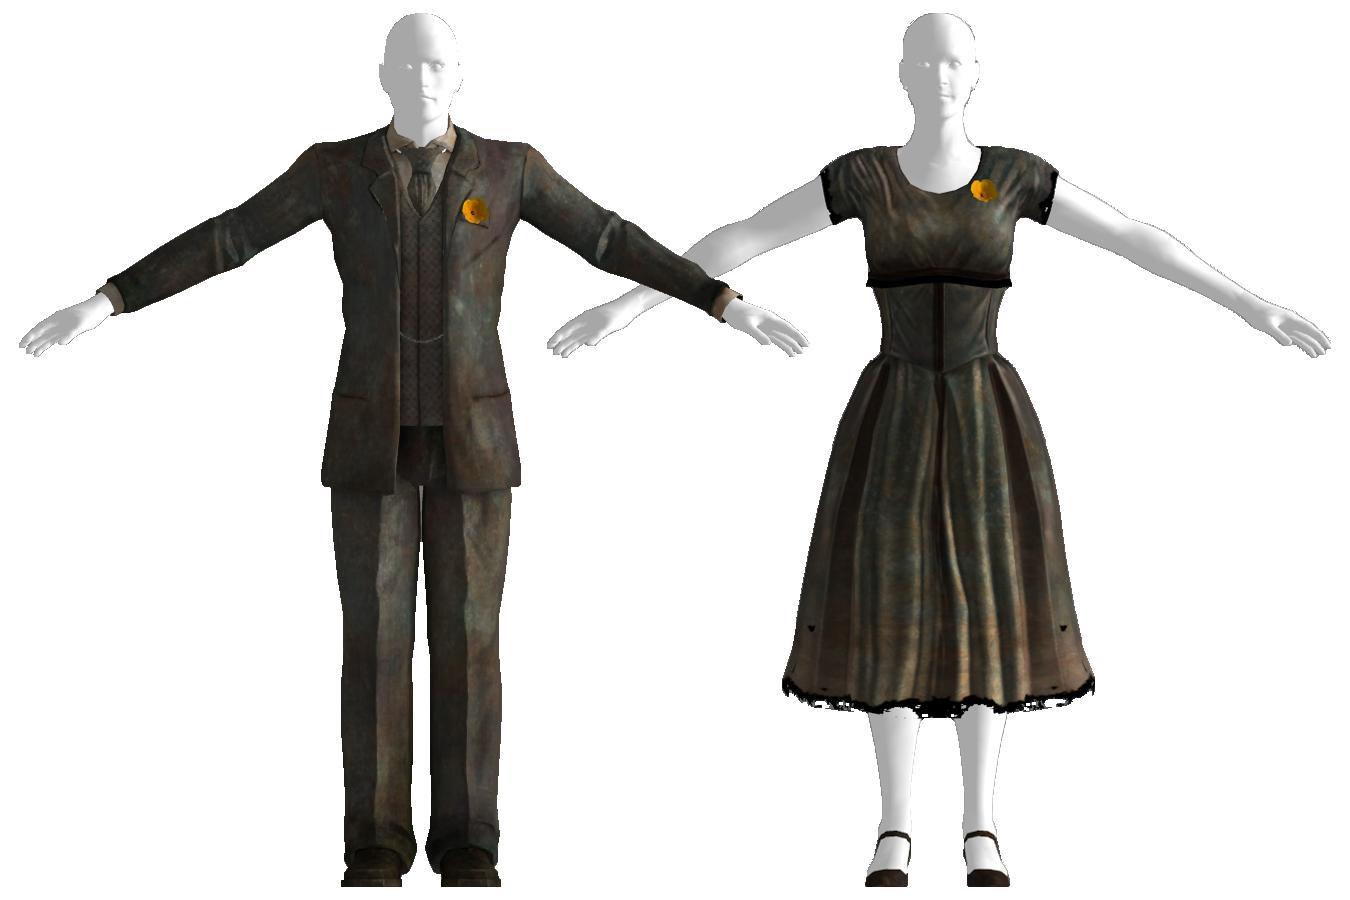 Ambassador Crocker's suit